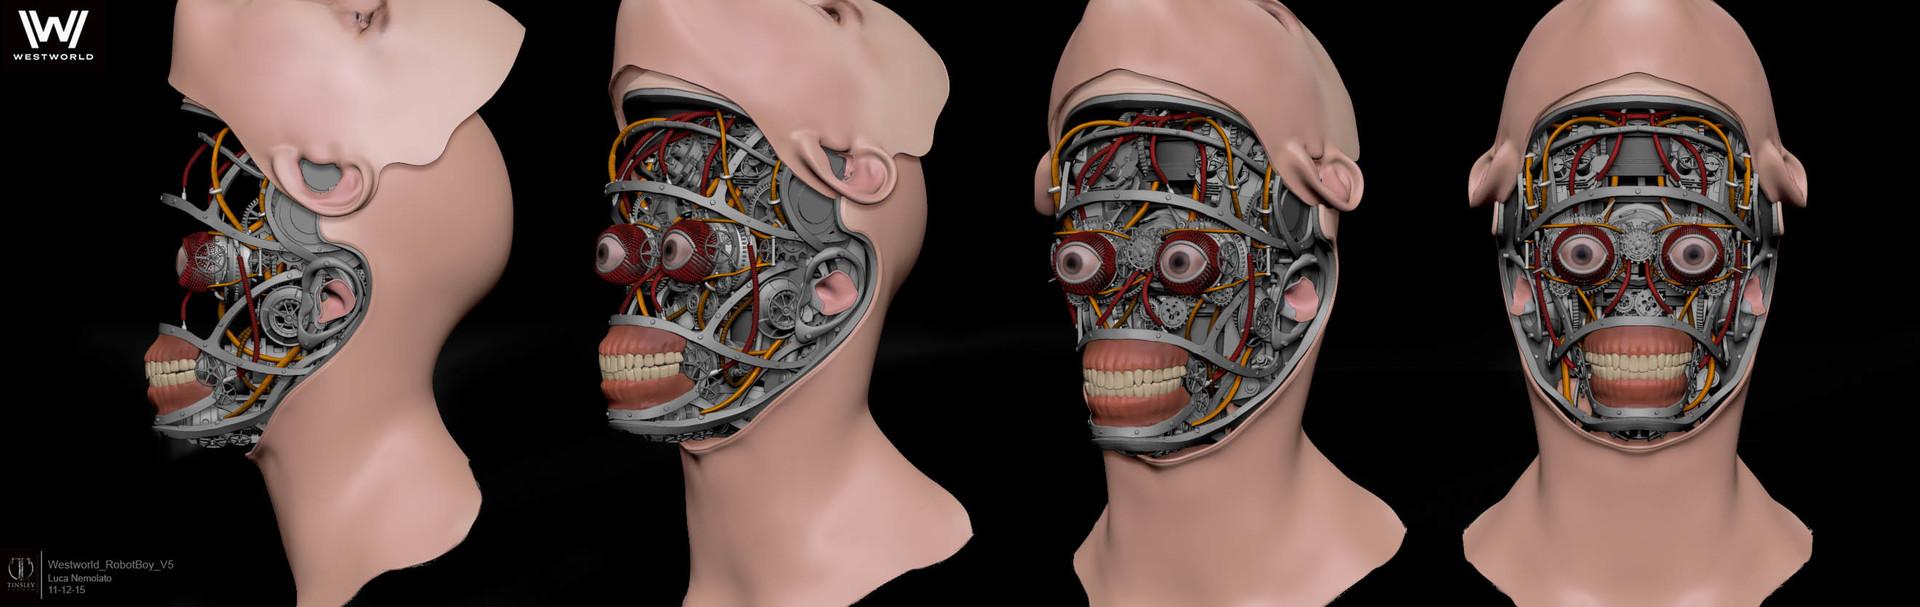 Luca Nemolato Hbo Westworld Robot Boy